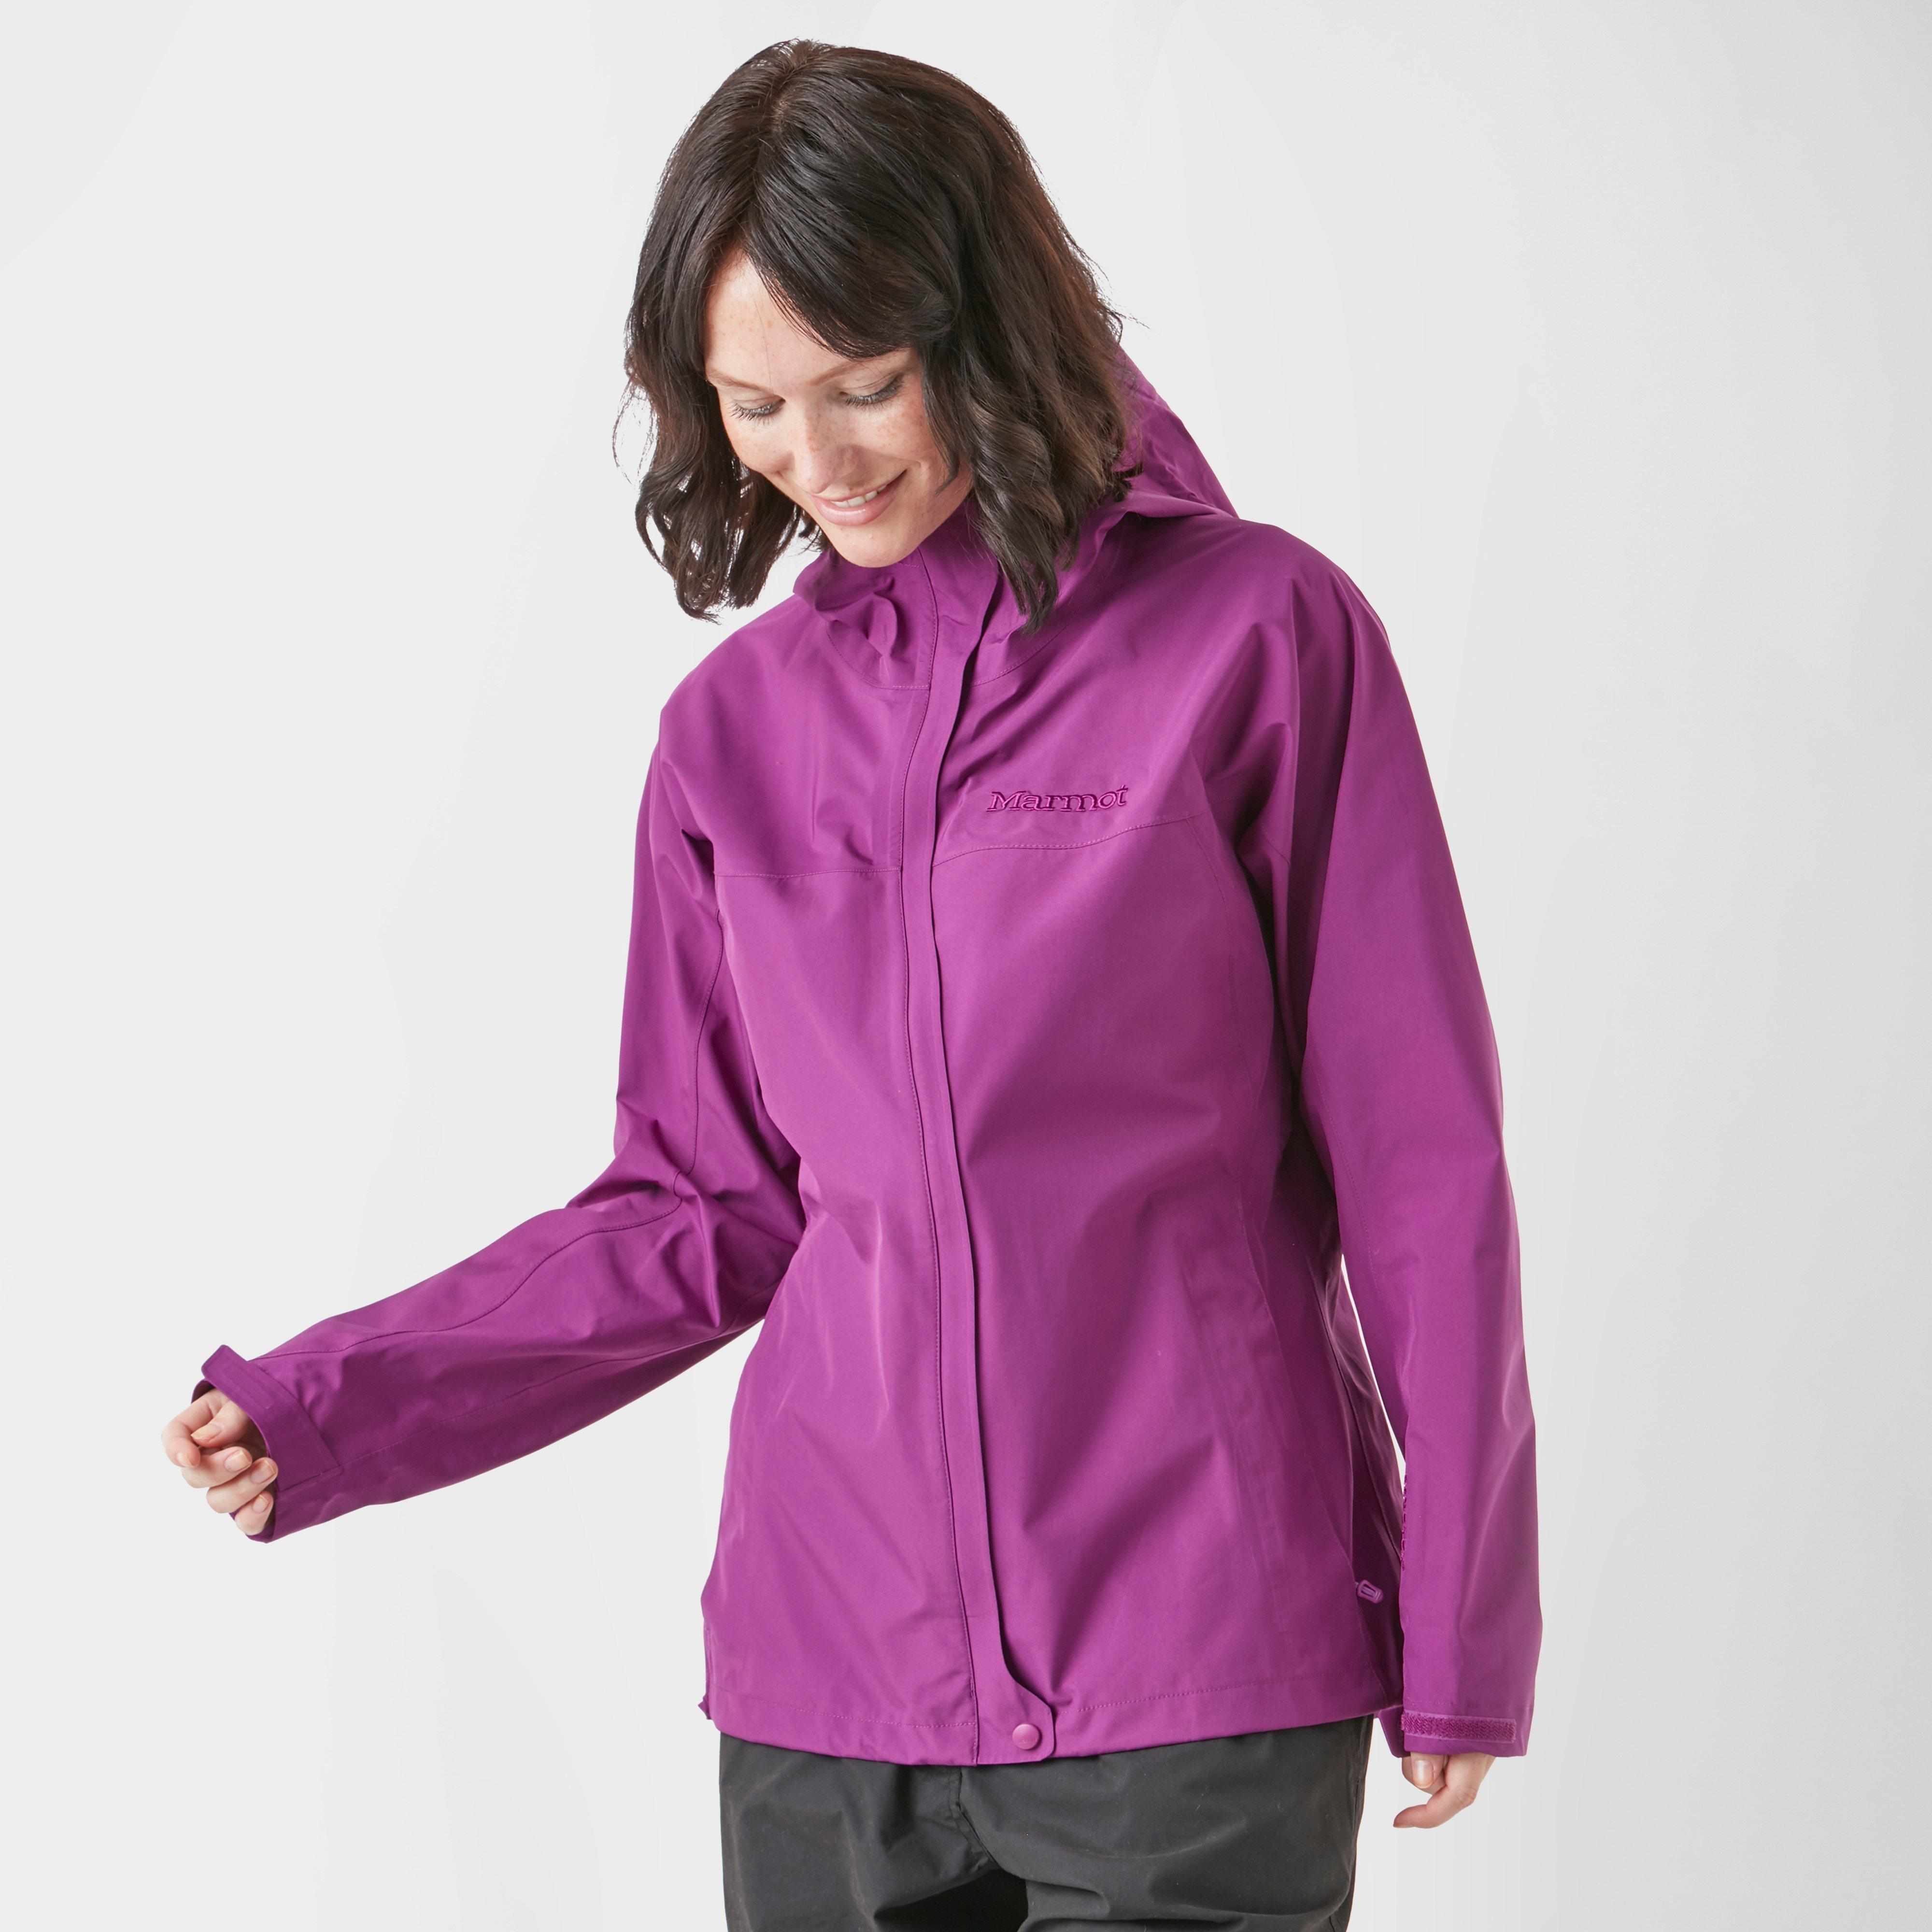 Marmot Women's Minimalist GORE-TEX Paclight Jacket, Purple